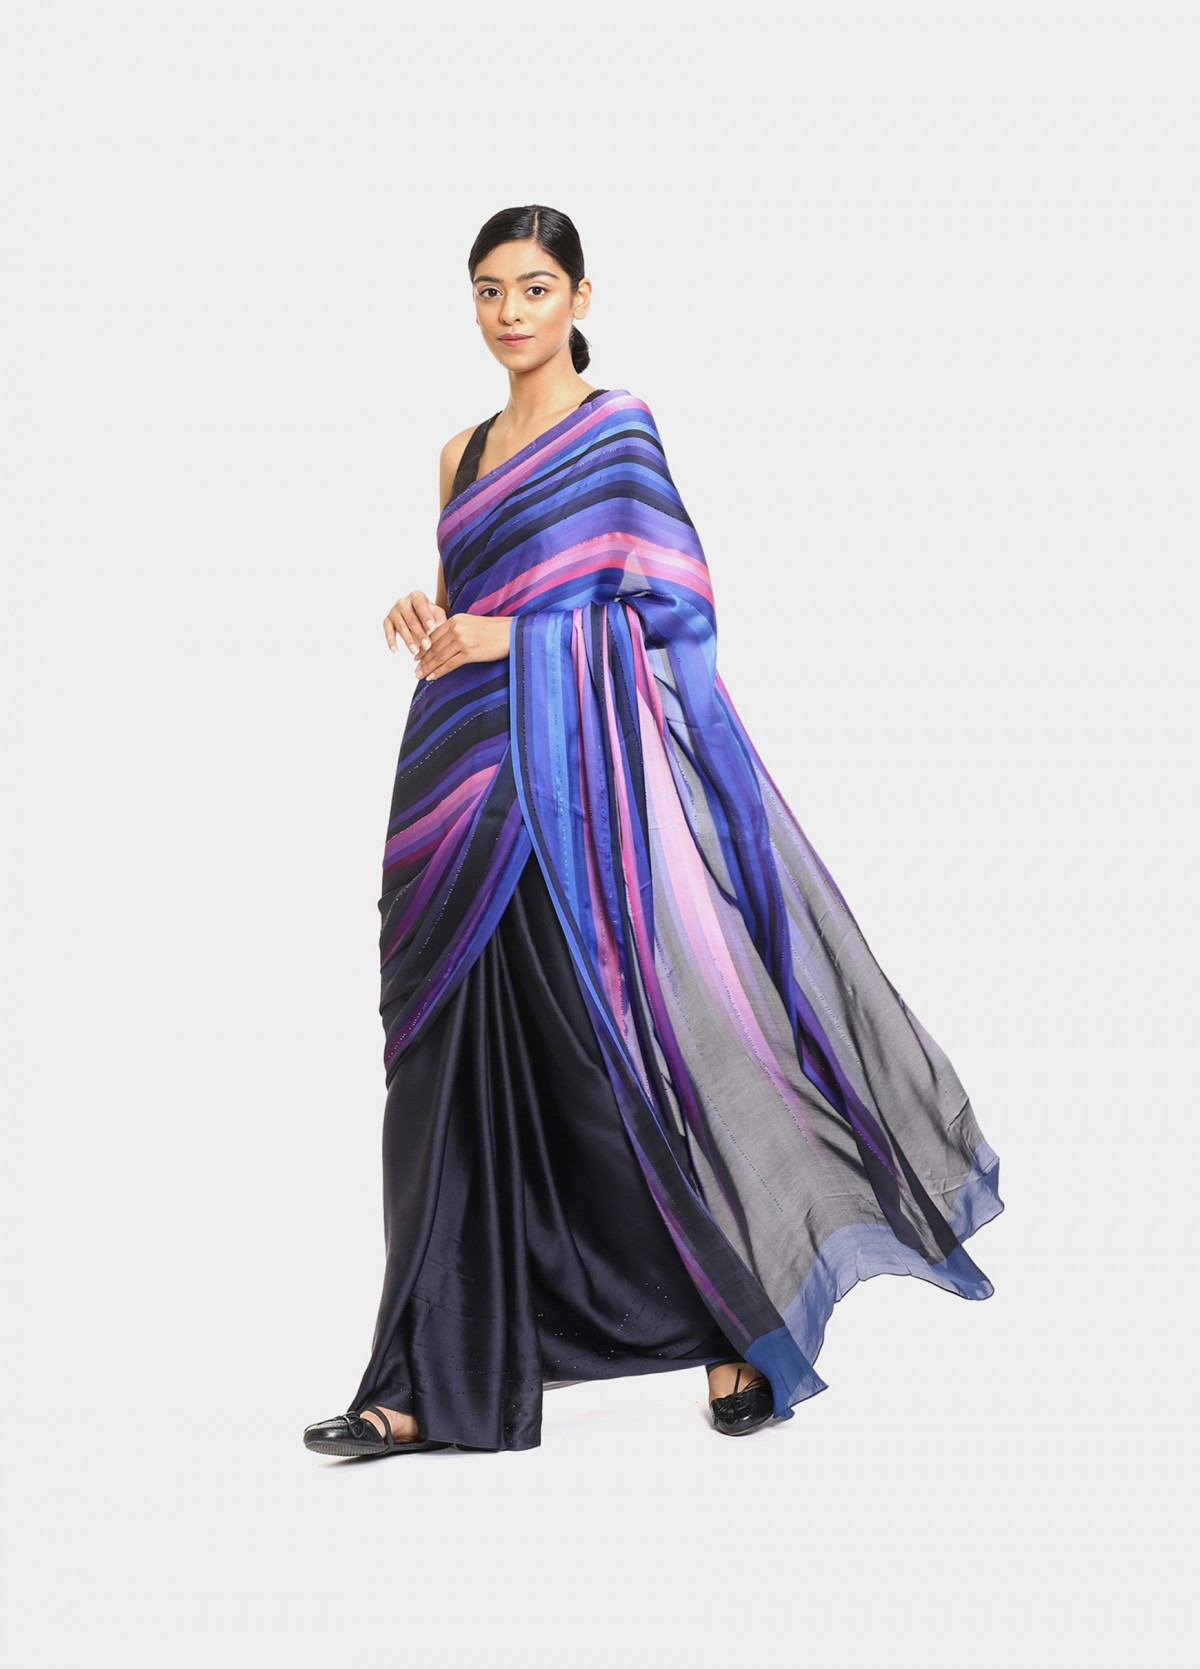 The Lumiere Sari